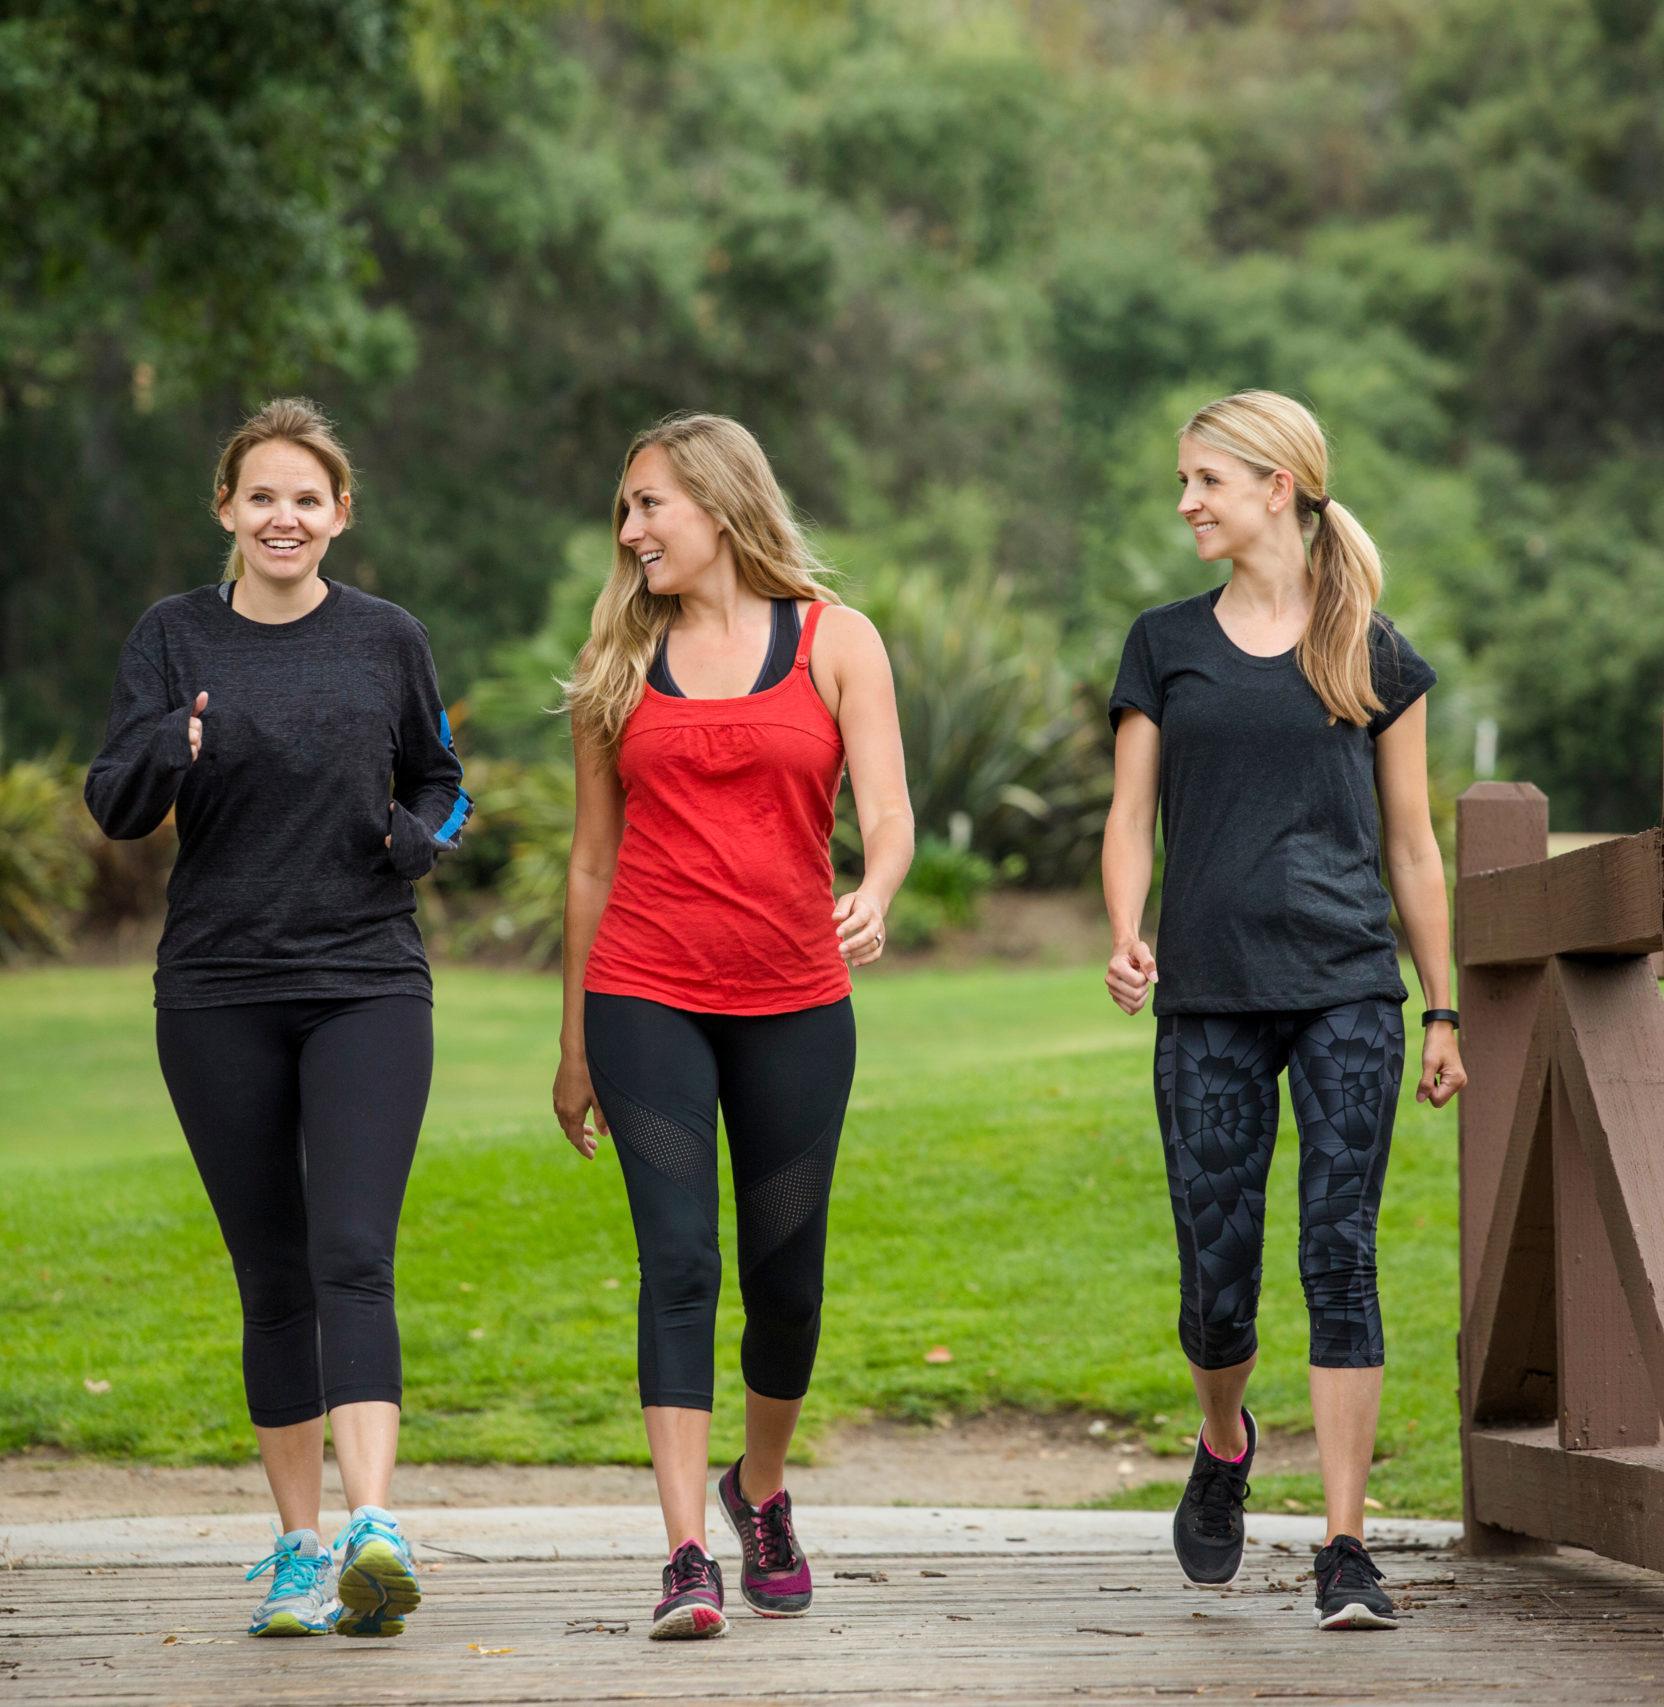 women's walking group